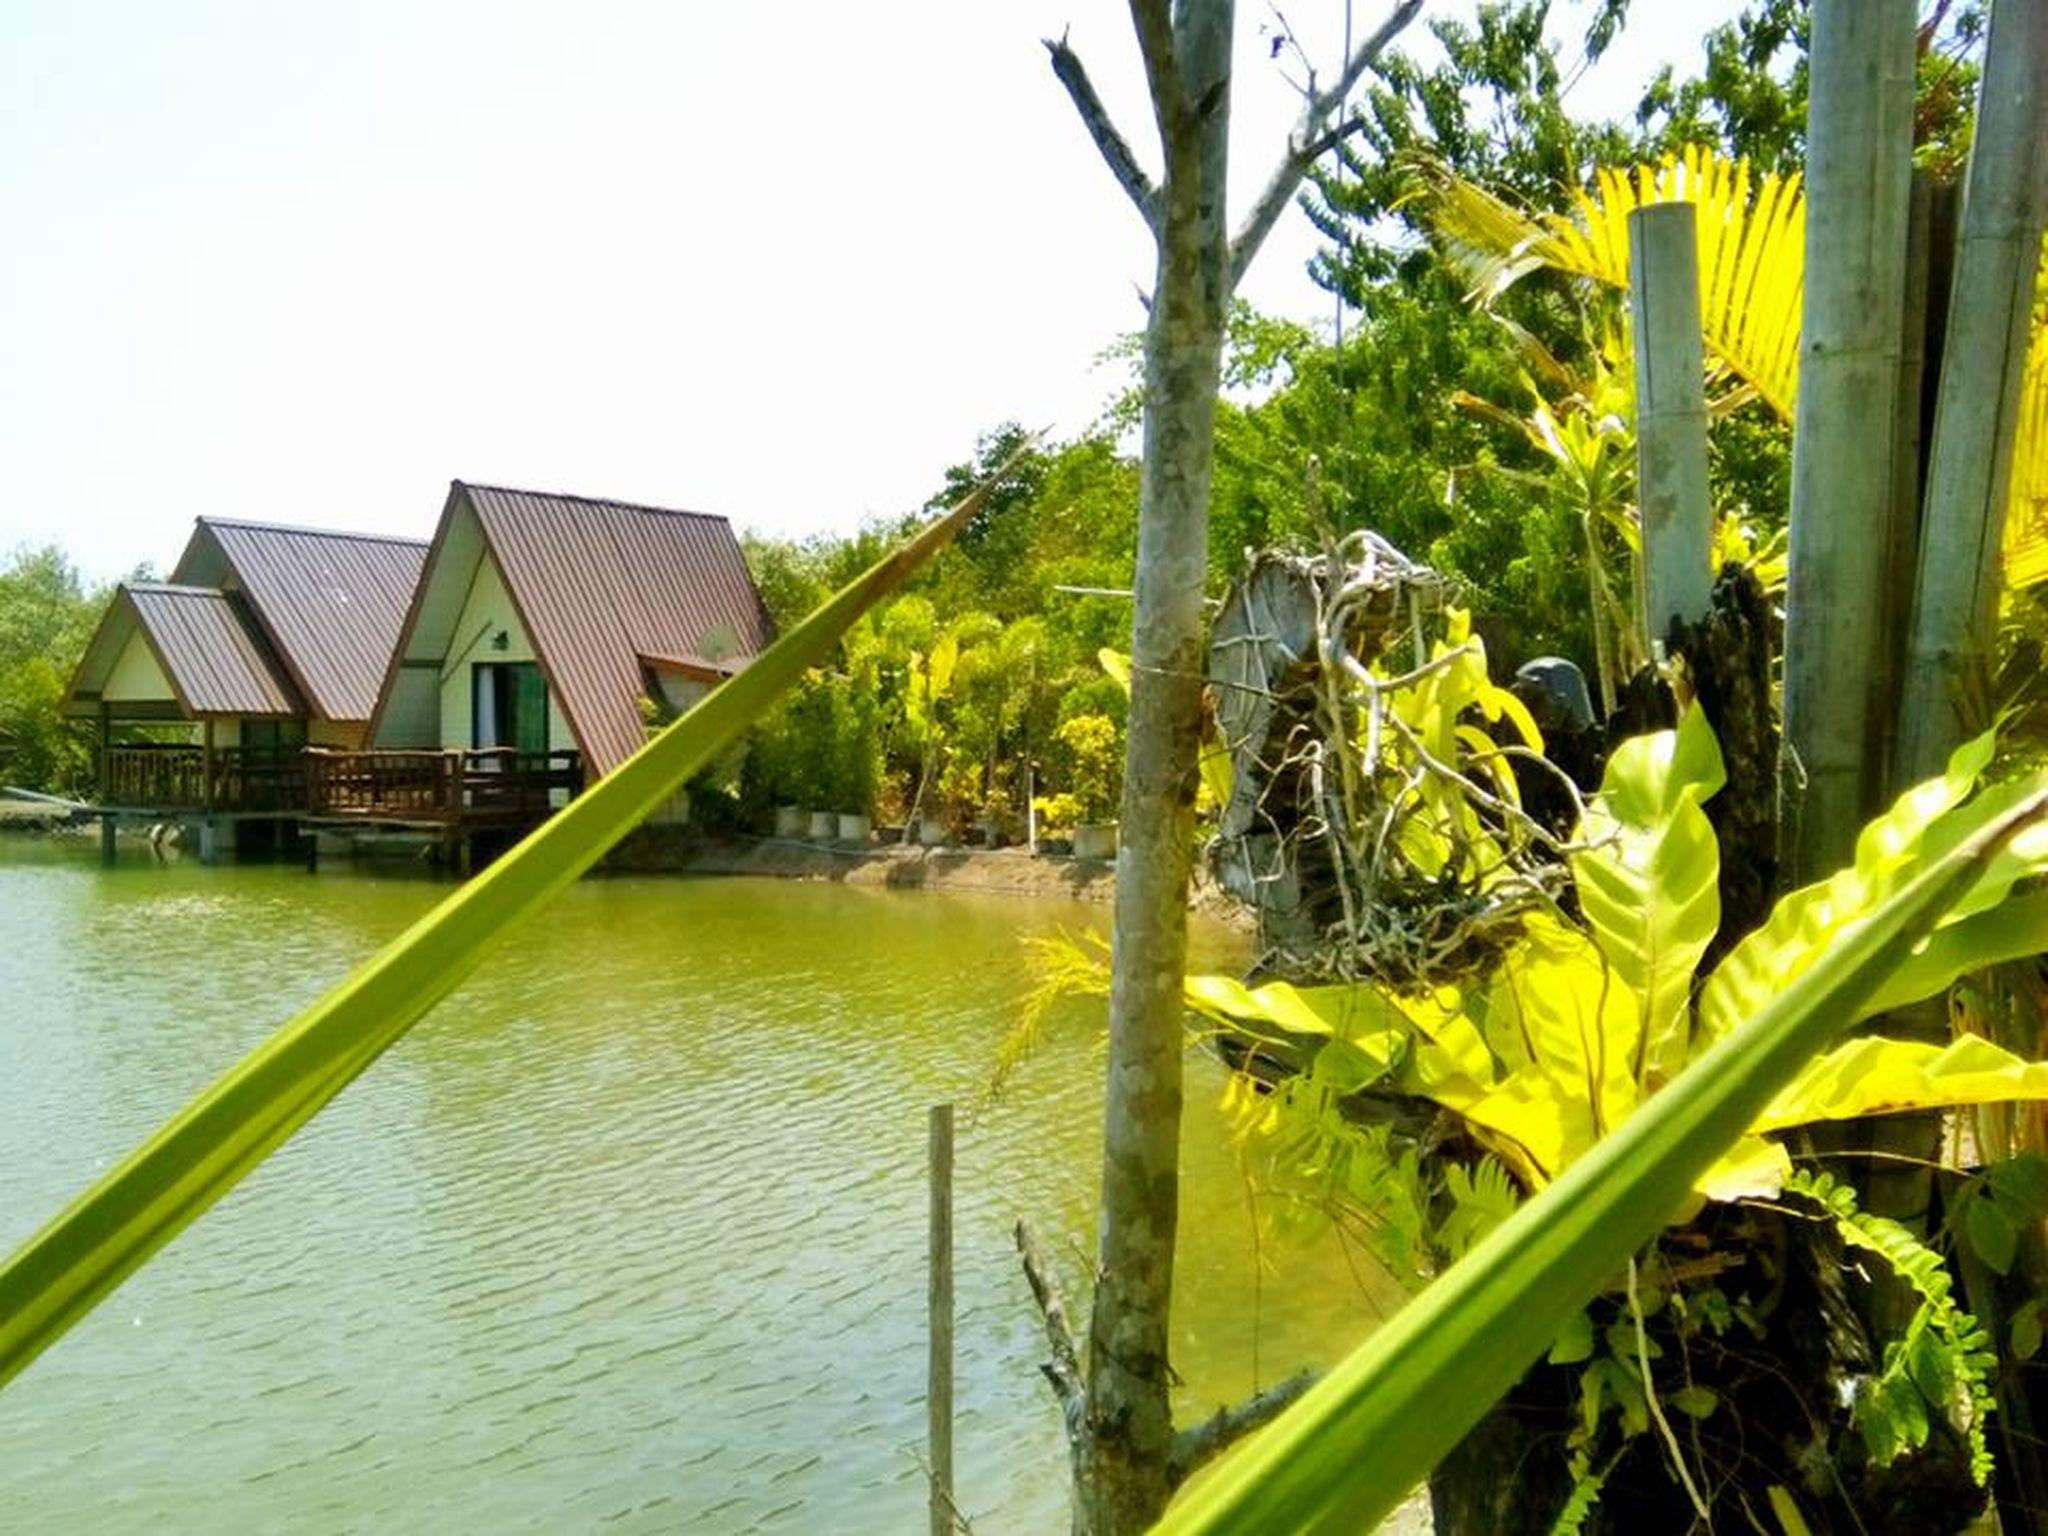 Koh Klang Riverside Homestay เกาะกลาง ริเวอร์ไซด์ โฮมสเตย์